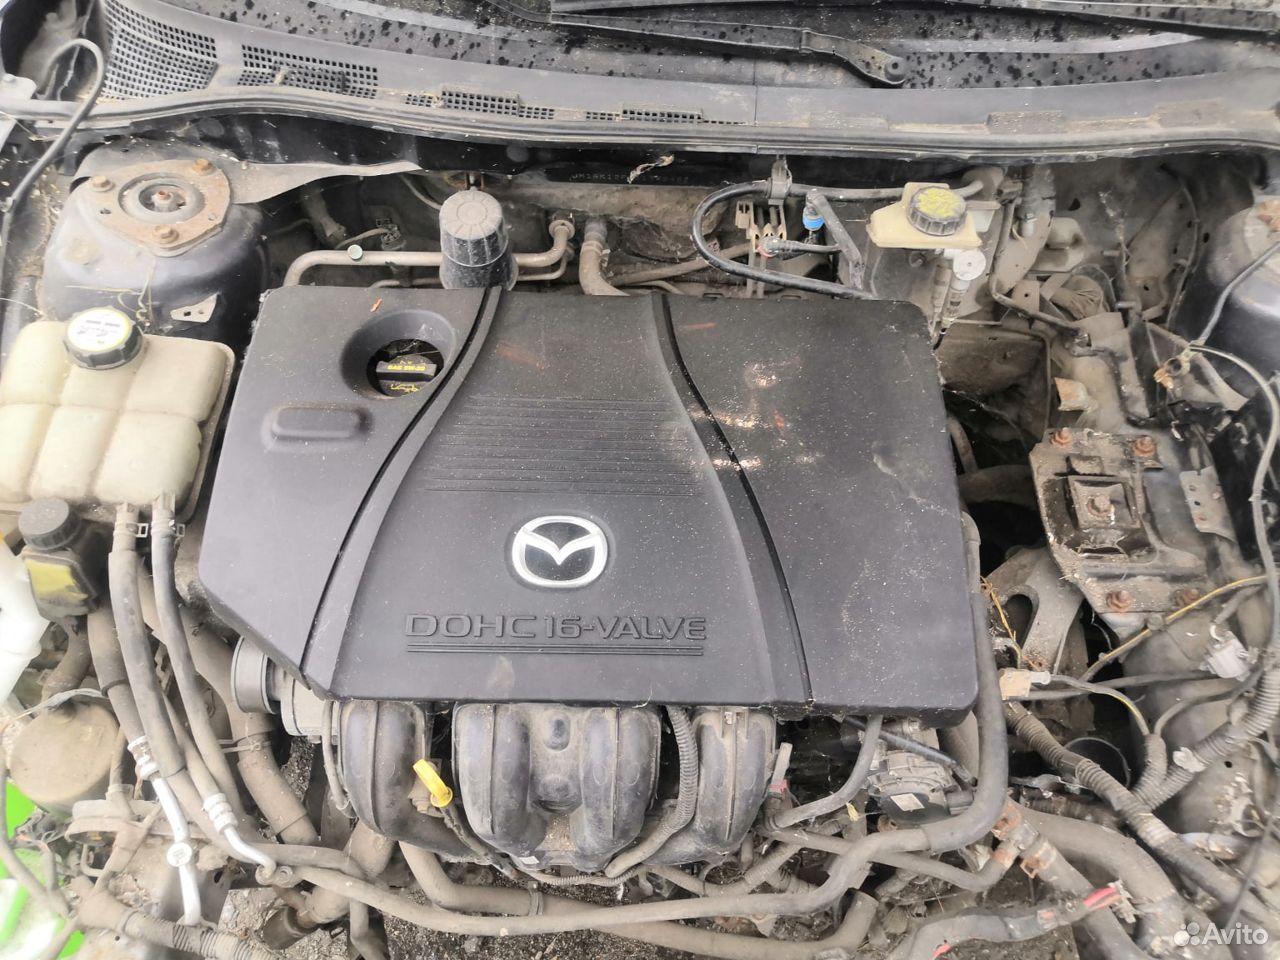 Mazda 3bk ы разб